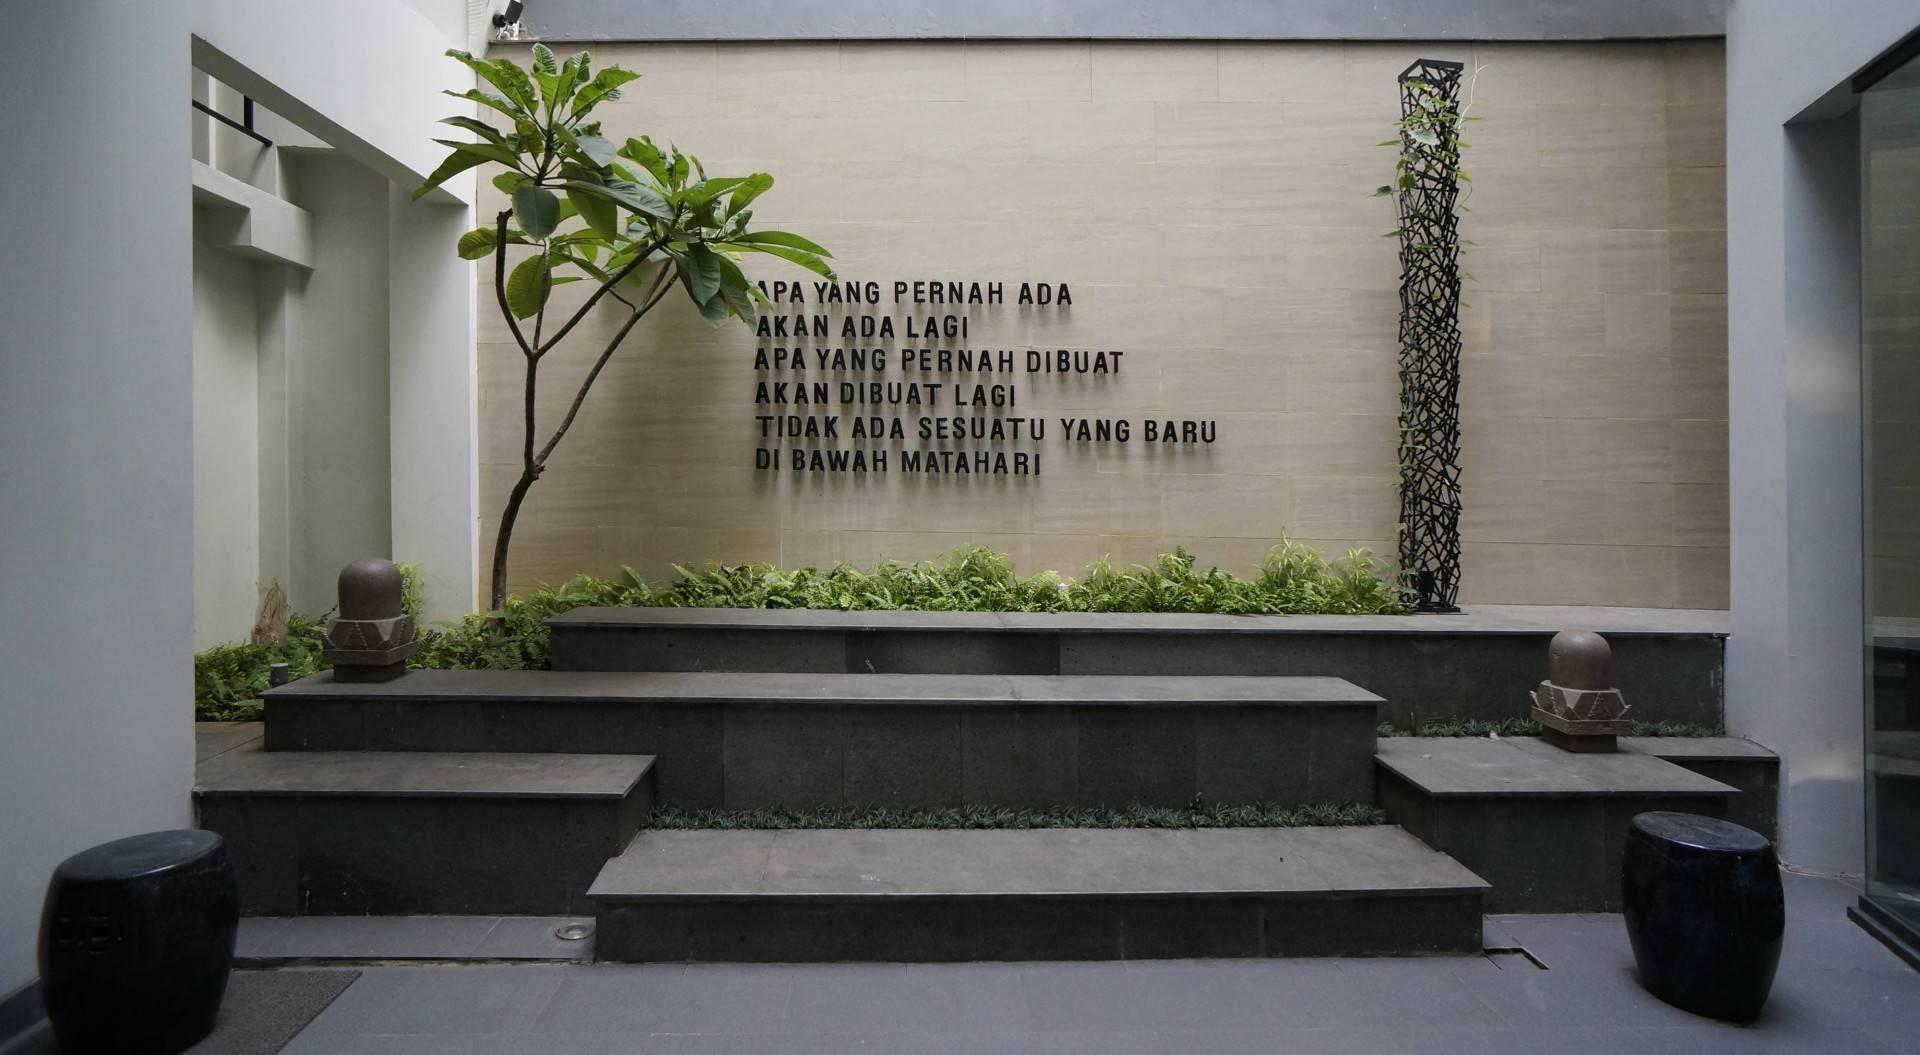 Sonny Sutanto Architects Sonny Sutanto Architects New Office Sunter, North Jakarta, Indonesia Sunter, North Jakarta, Indonesia Courtyard  <P>Ecclesiastes 1:9</p> 2100